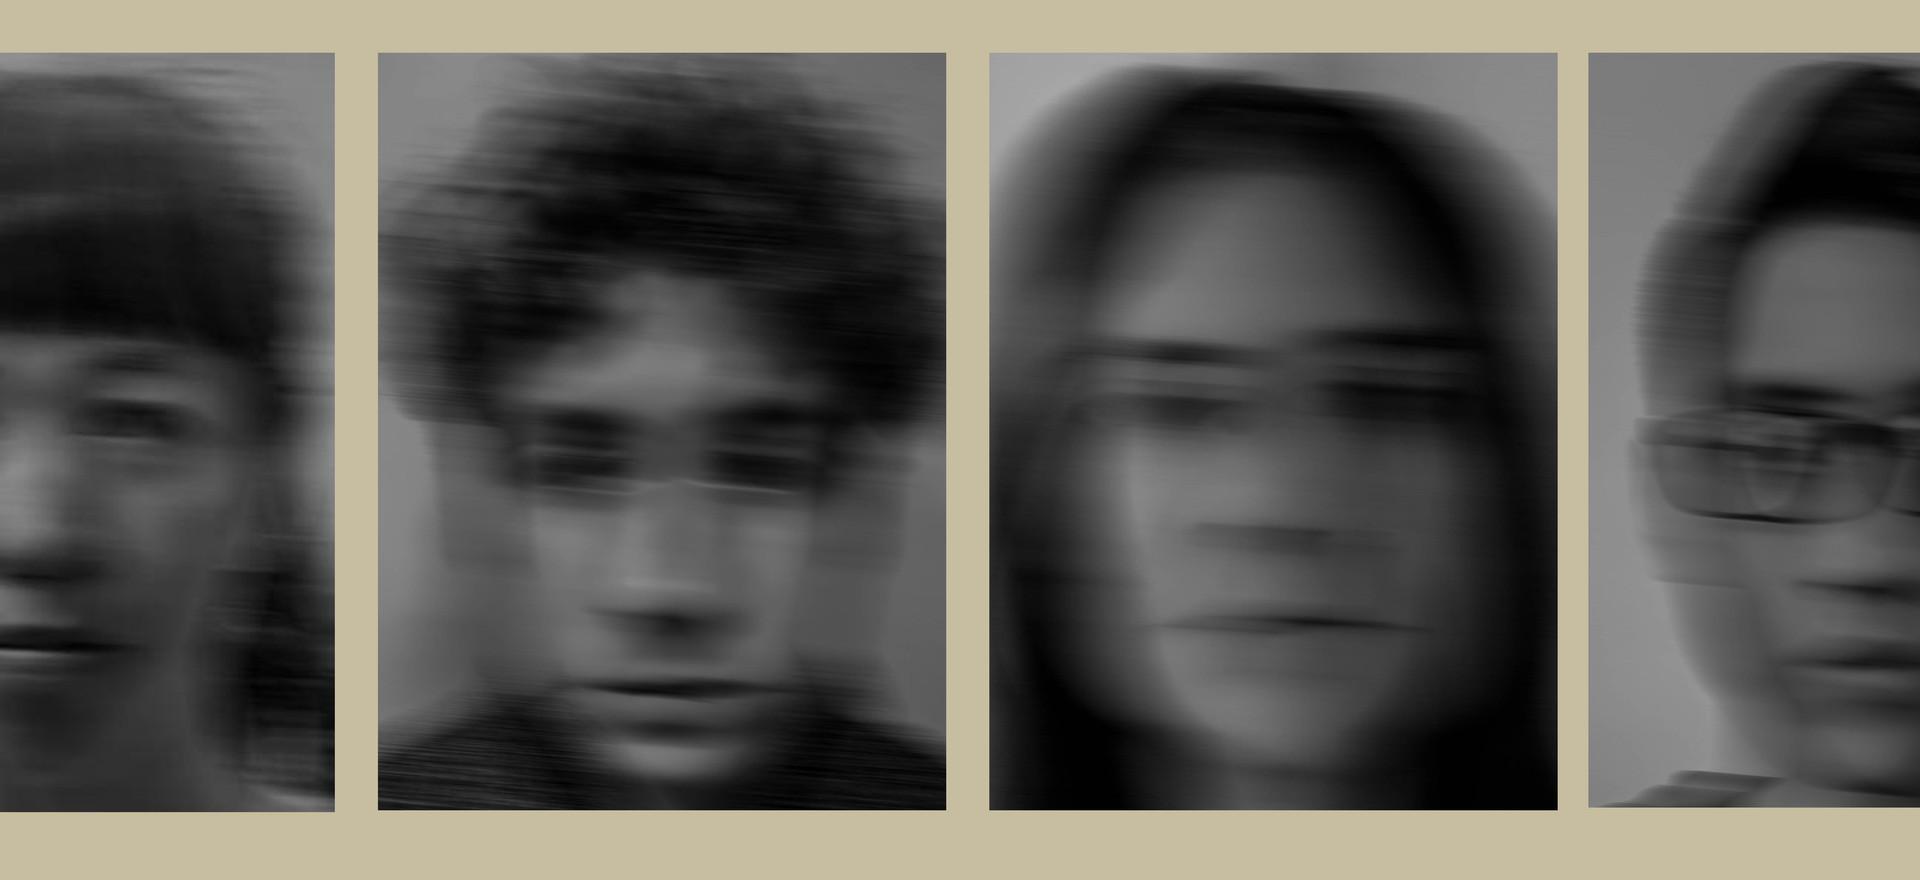 00 portraits_full series.jpg